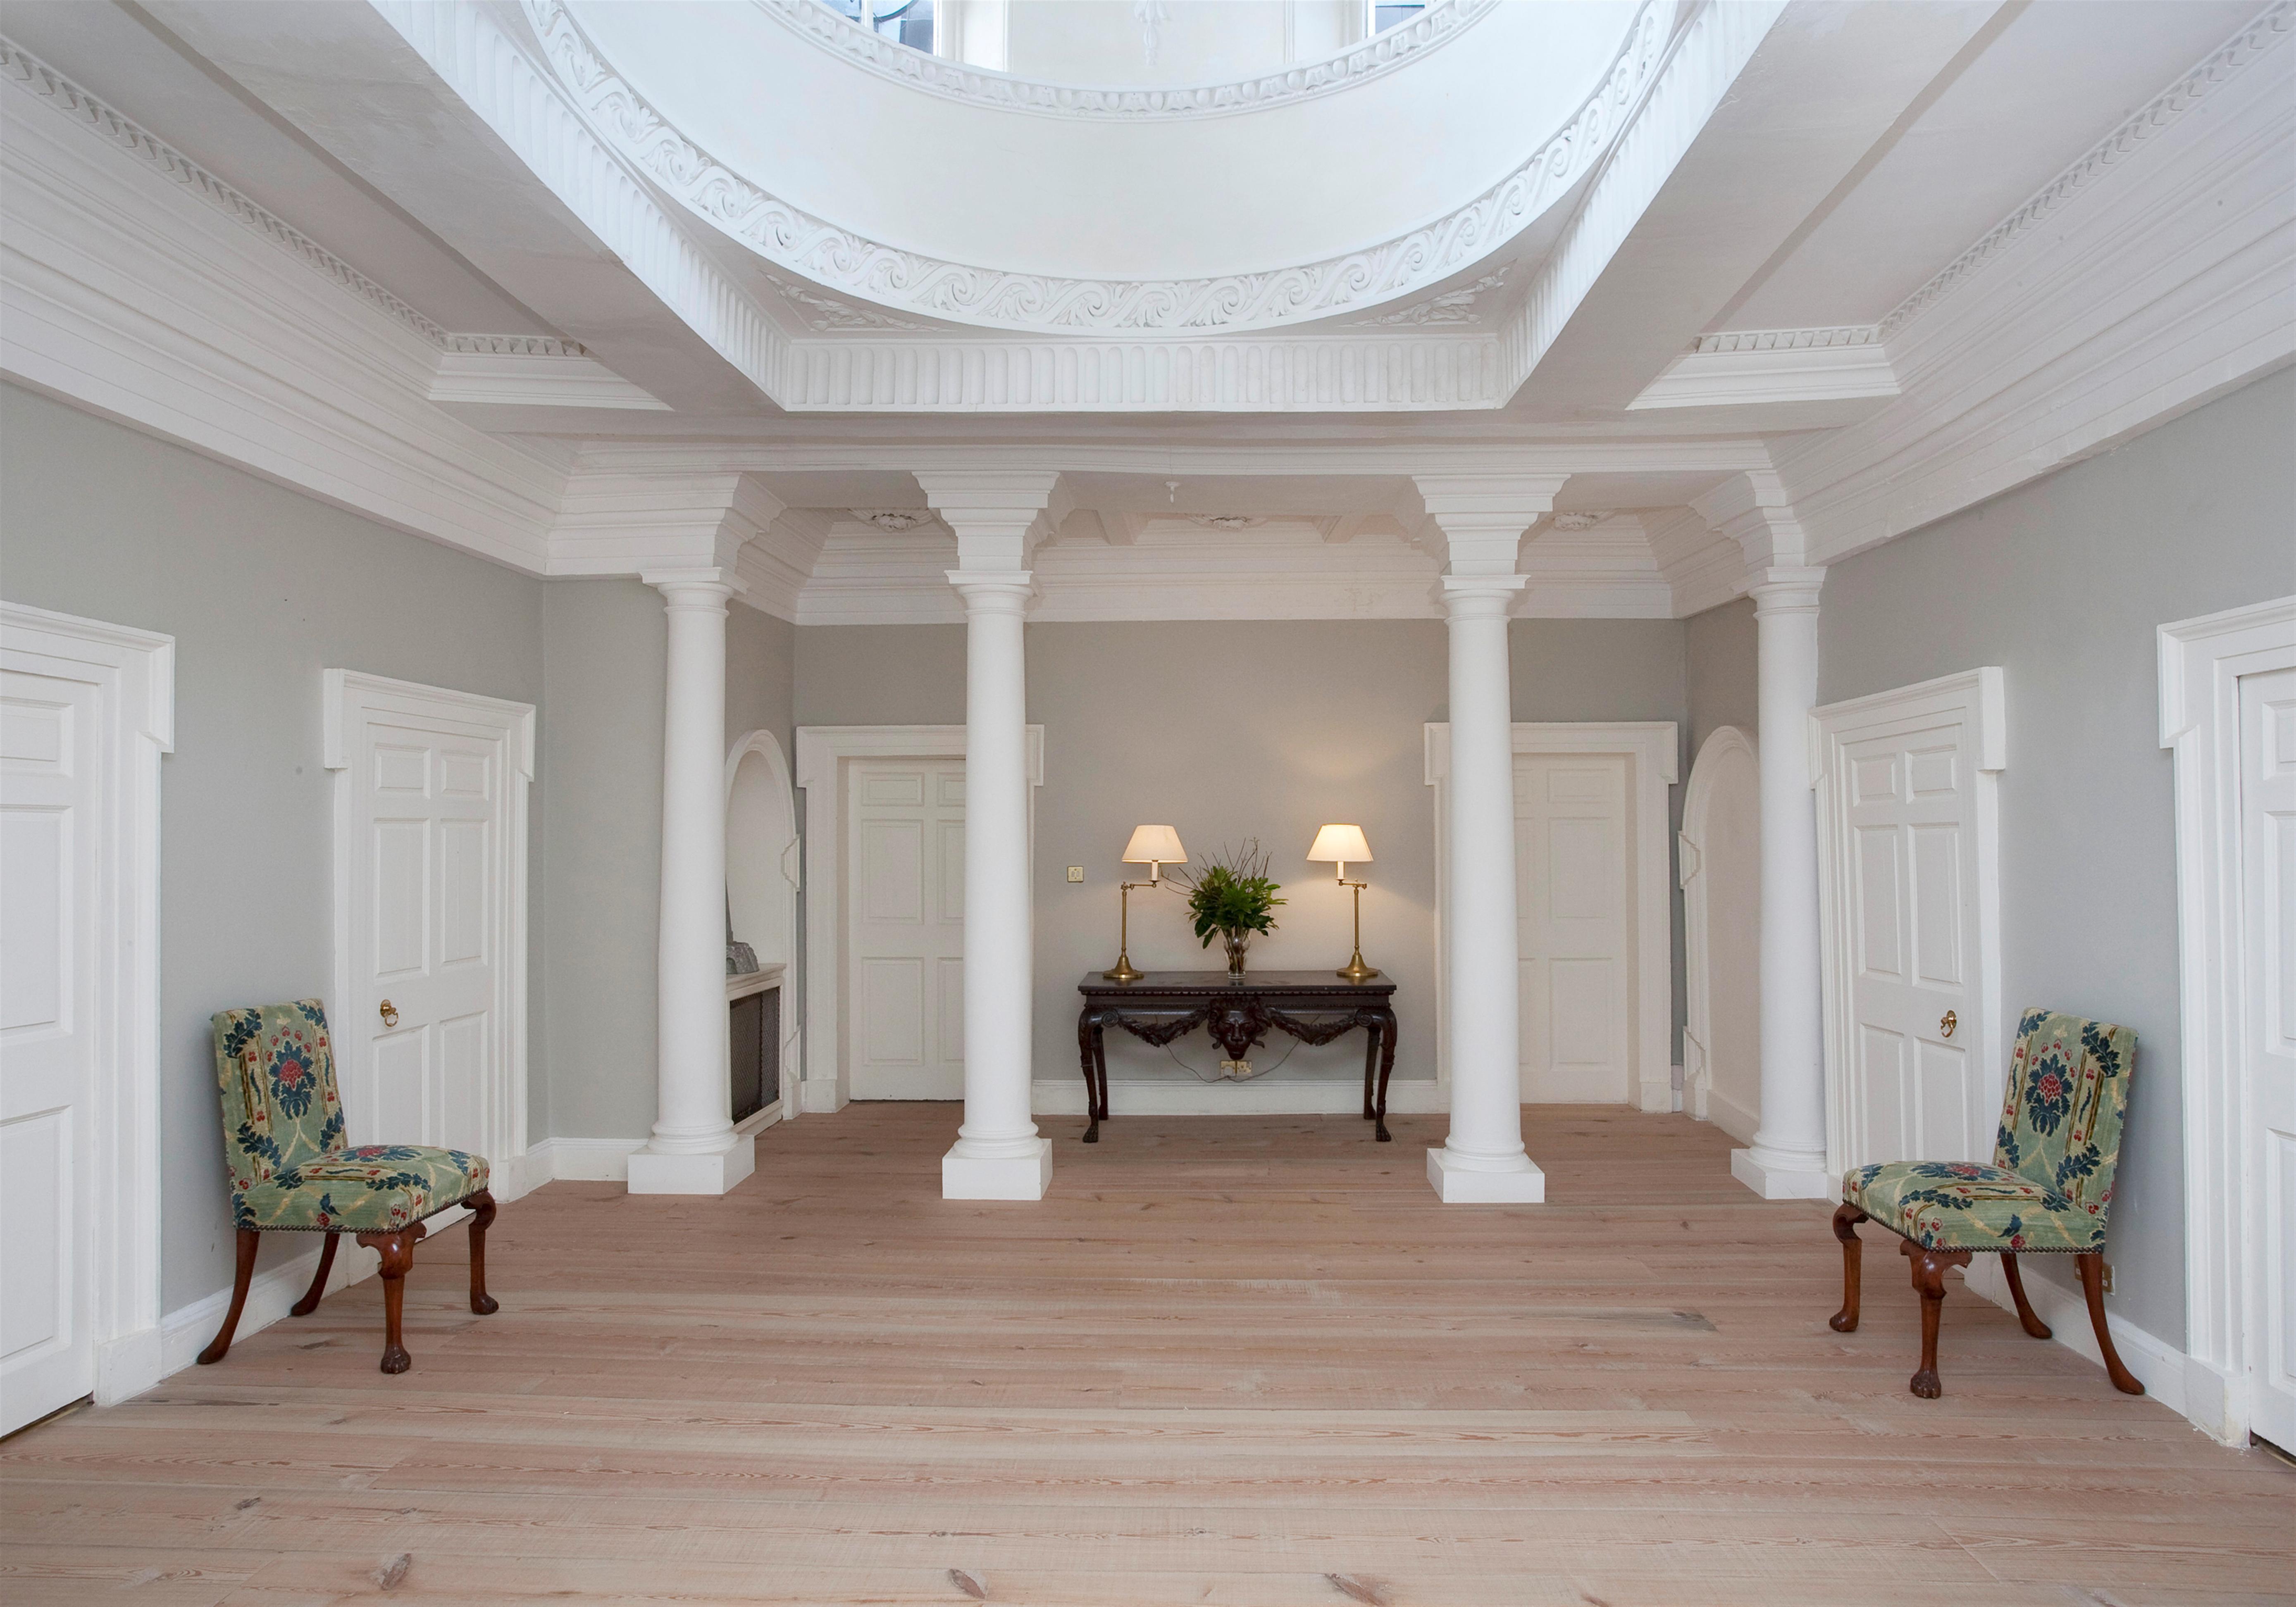 Bellamont-F-lobby.jpg#asset:13615